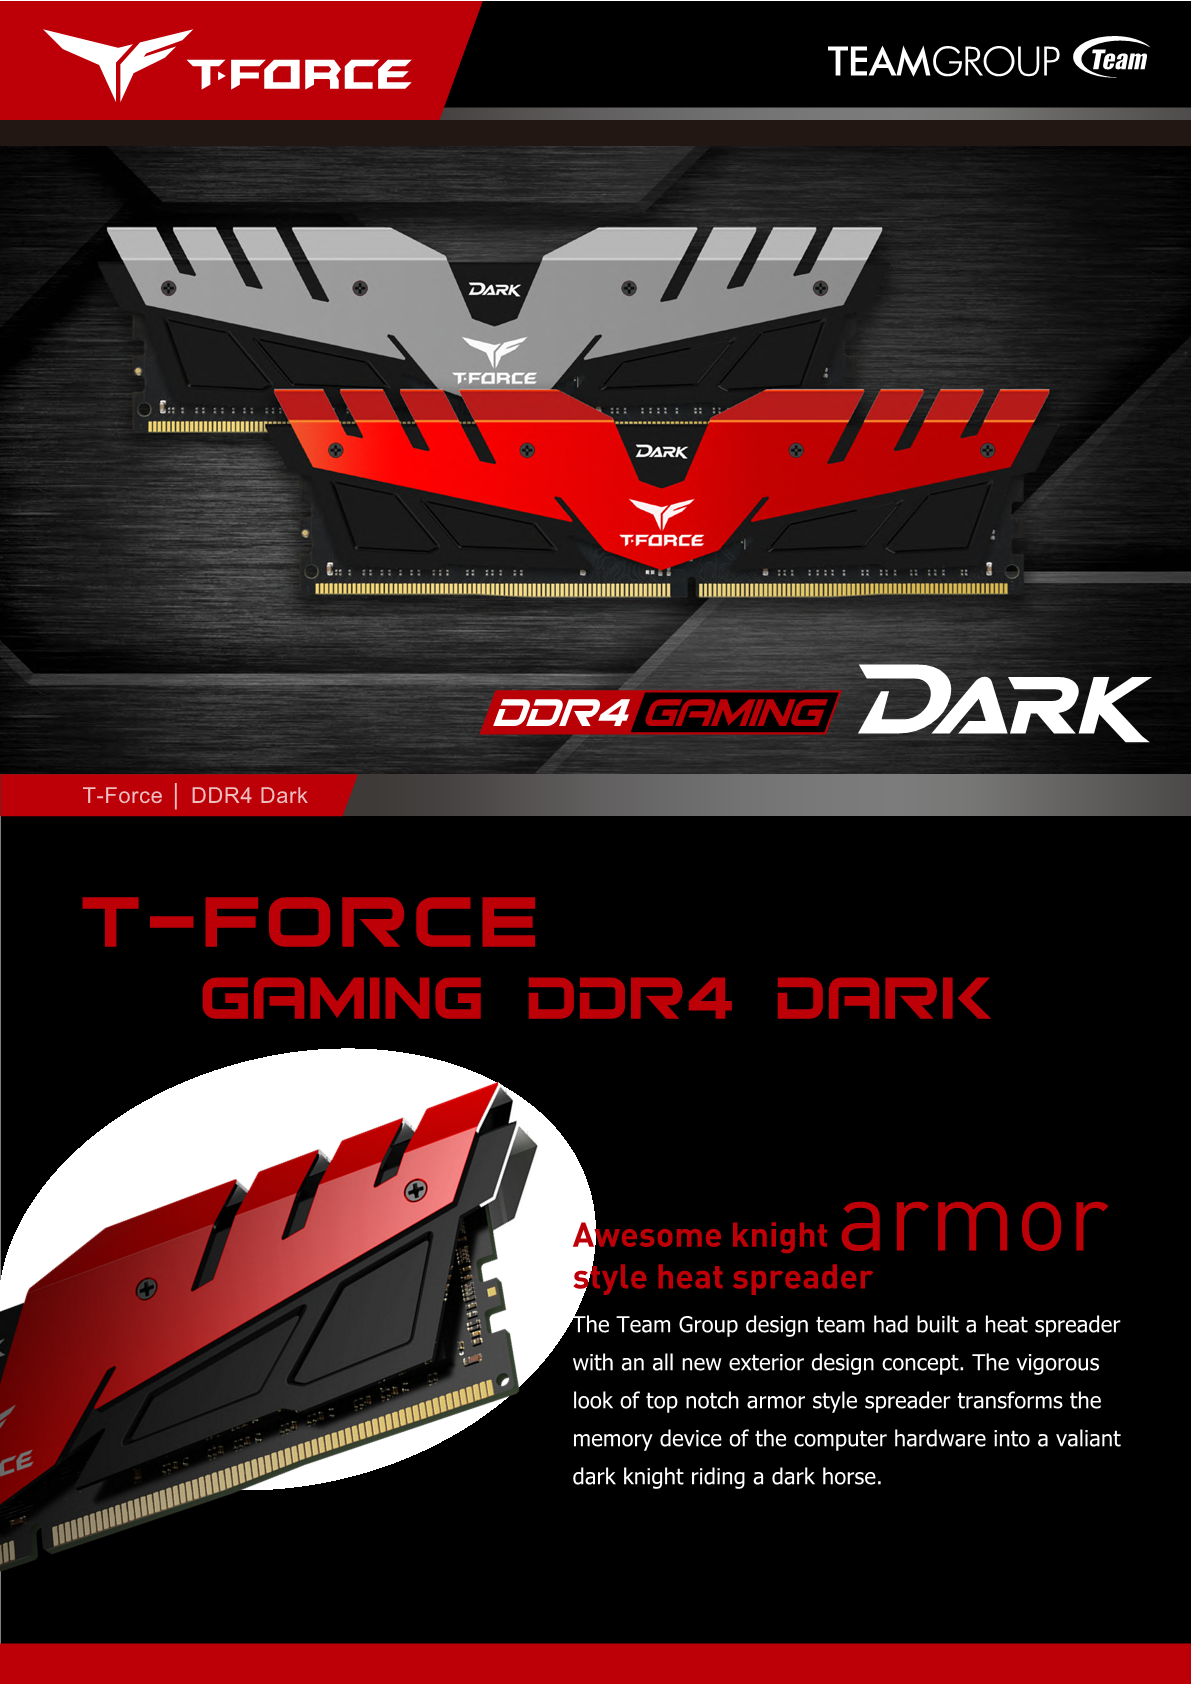 t_force_dark_ddr4_red_re_300.jpg